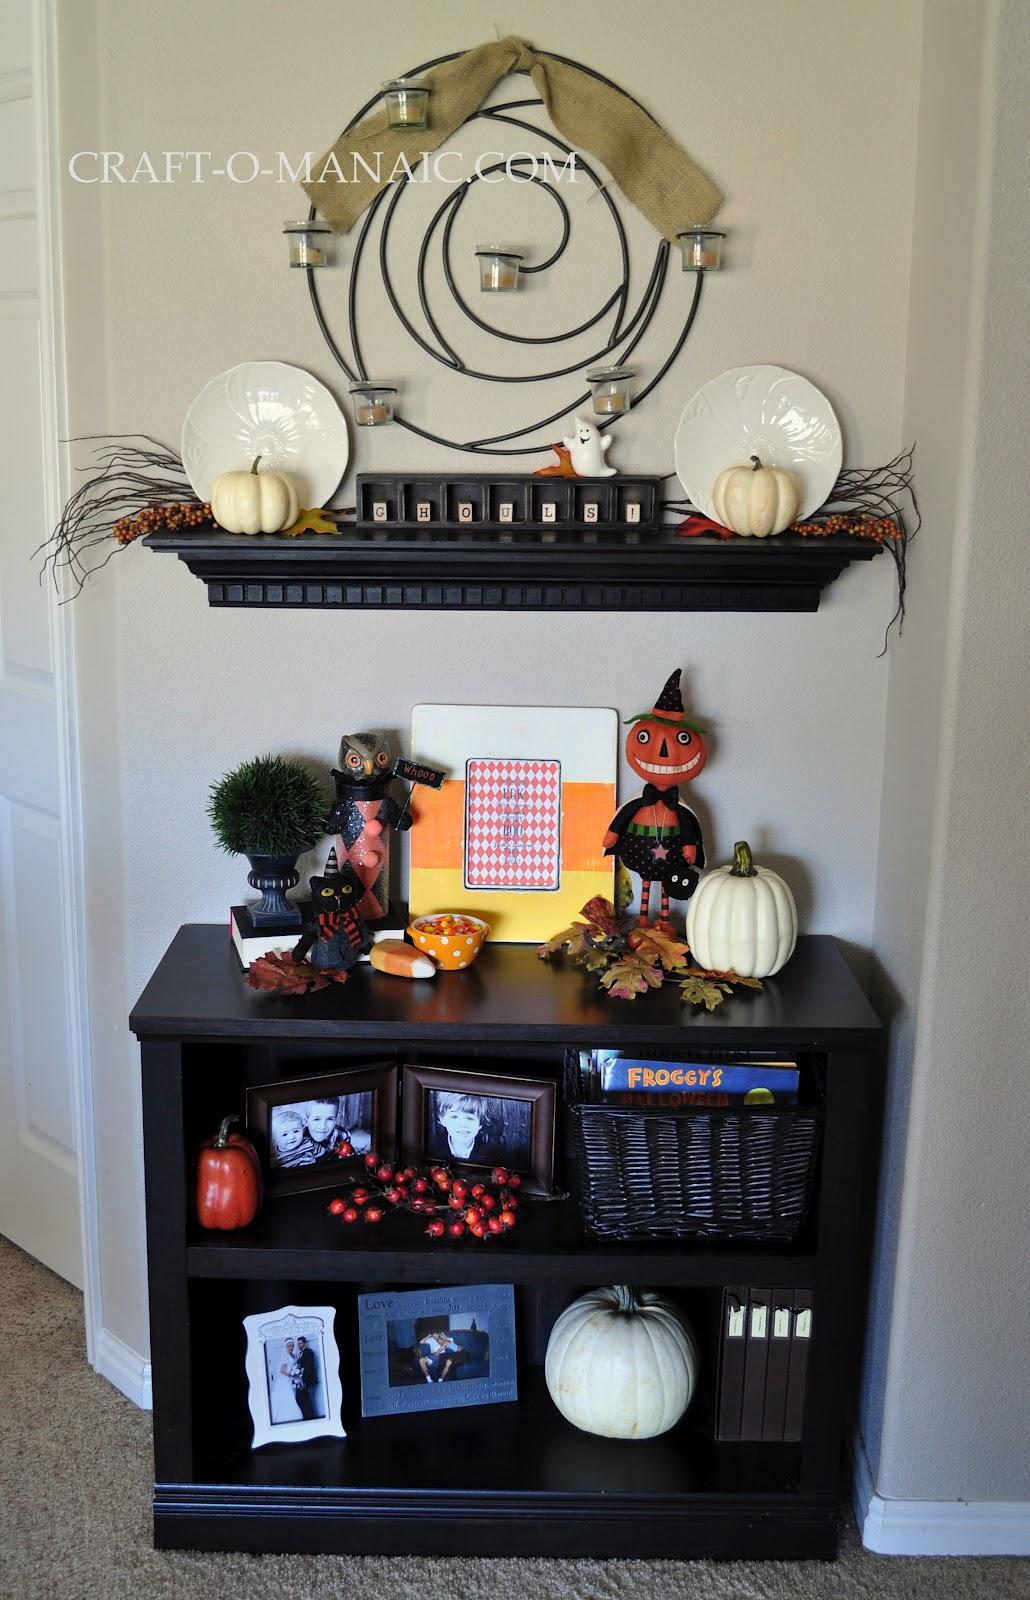 Halloween Decor Bookcase and Shelf - Craft-O-Maniac